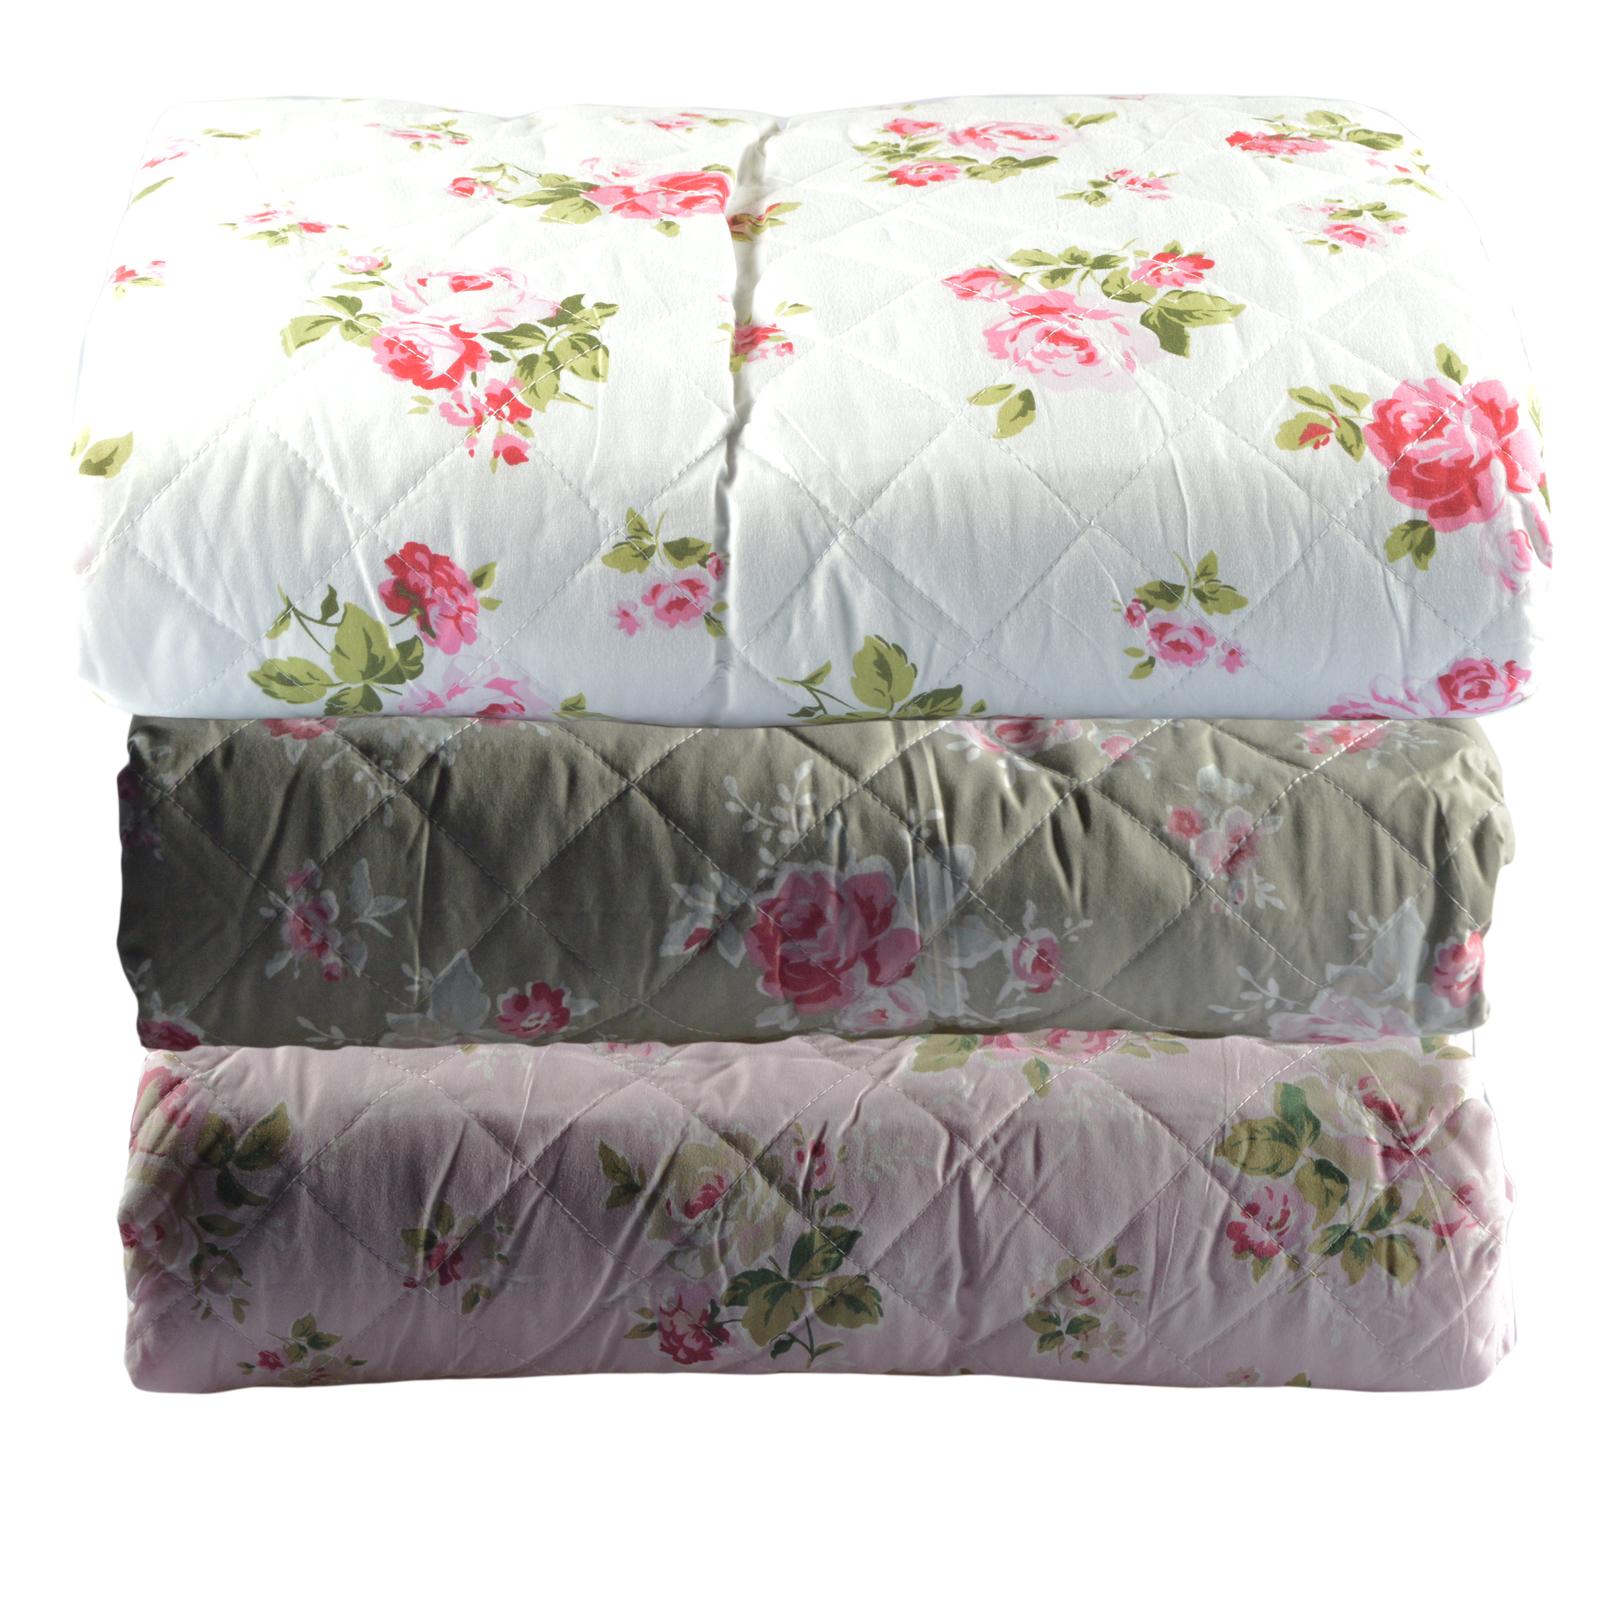 xxl tagesdecke romantik decke bergr e bett berwurf blumen kuschelig 240x220 ebay. Black Bedroom Furniture Sets. Home Design Ideas